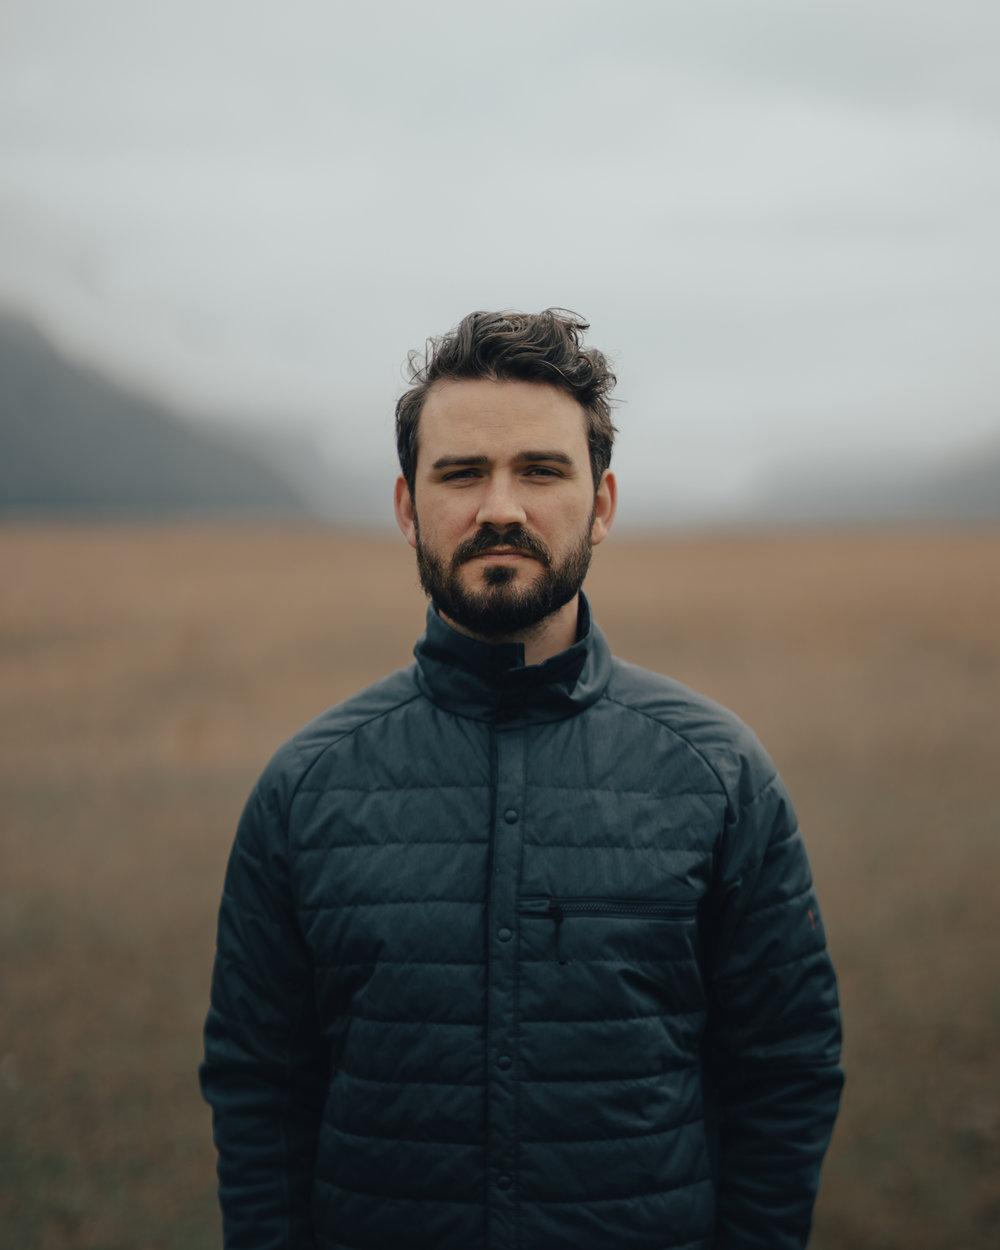 Garrett King - @shortstache|shortstache.com